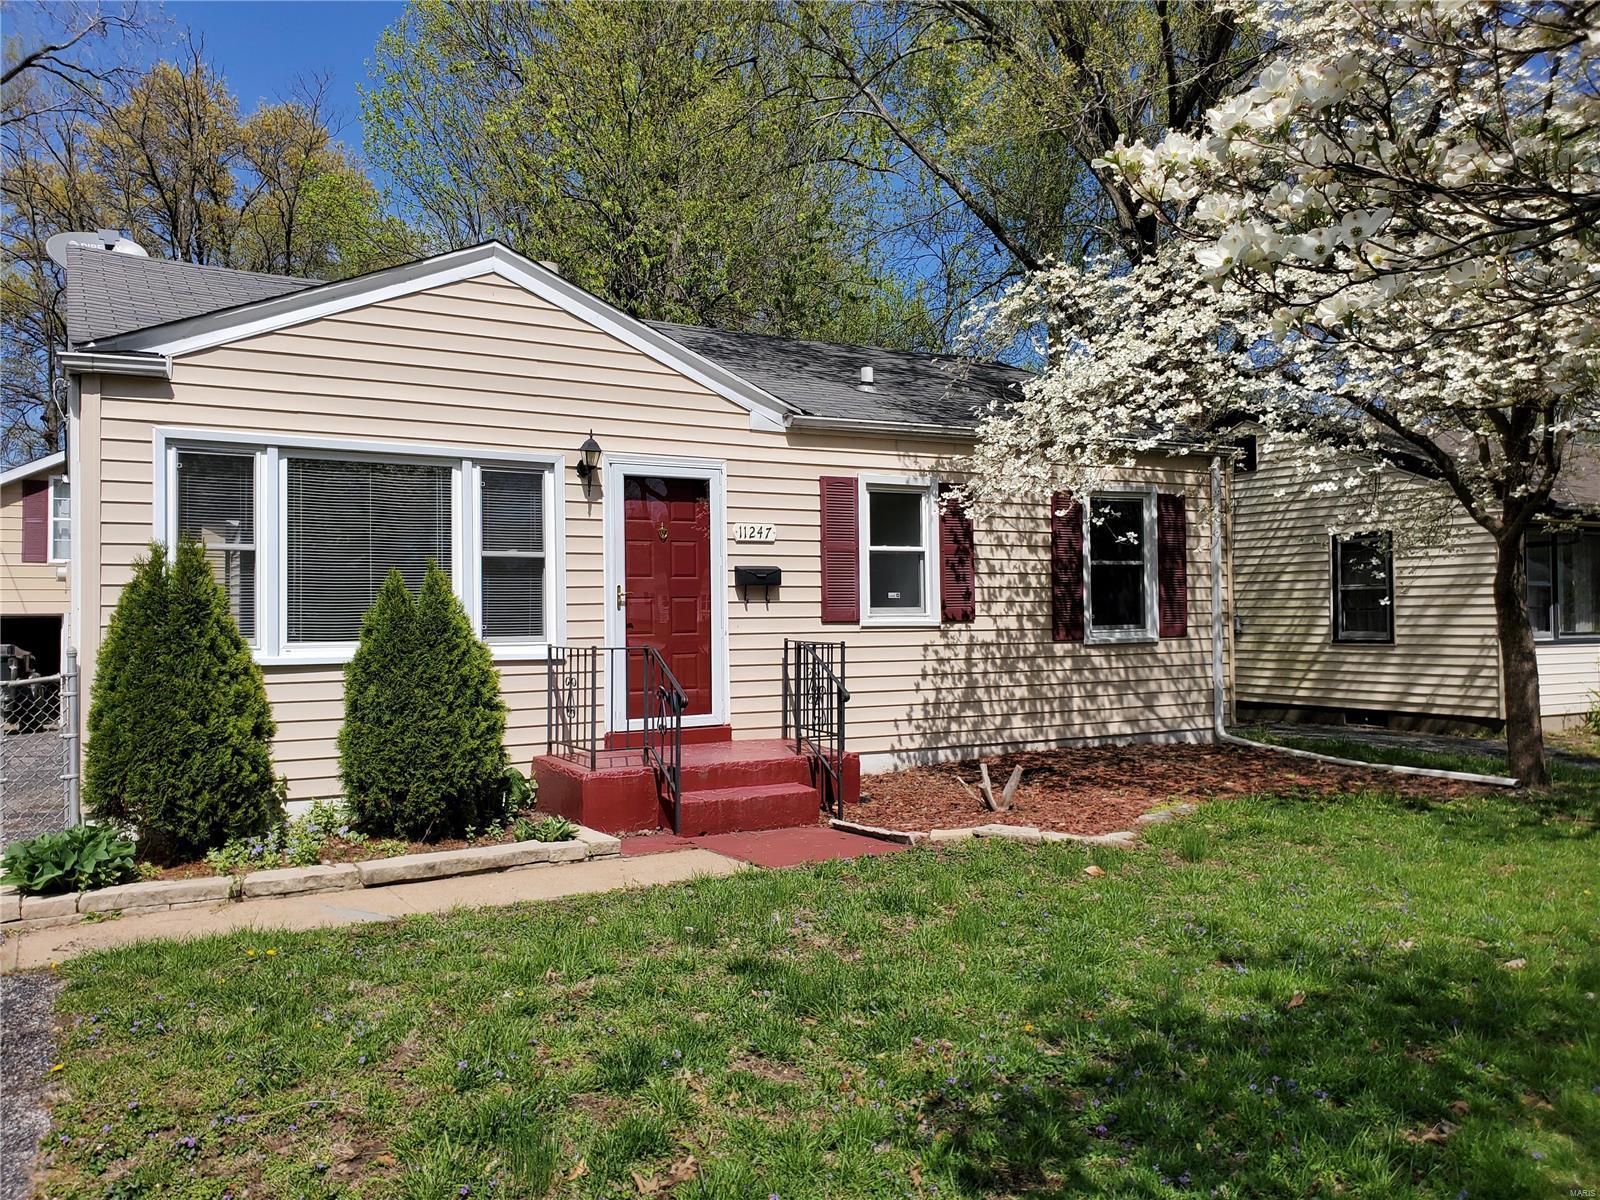 11247 Saint Damian Property Photo - St Ann, MO real estate listing